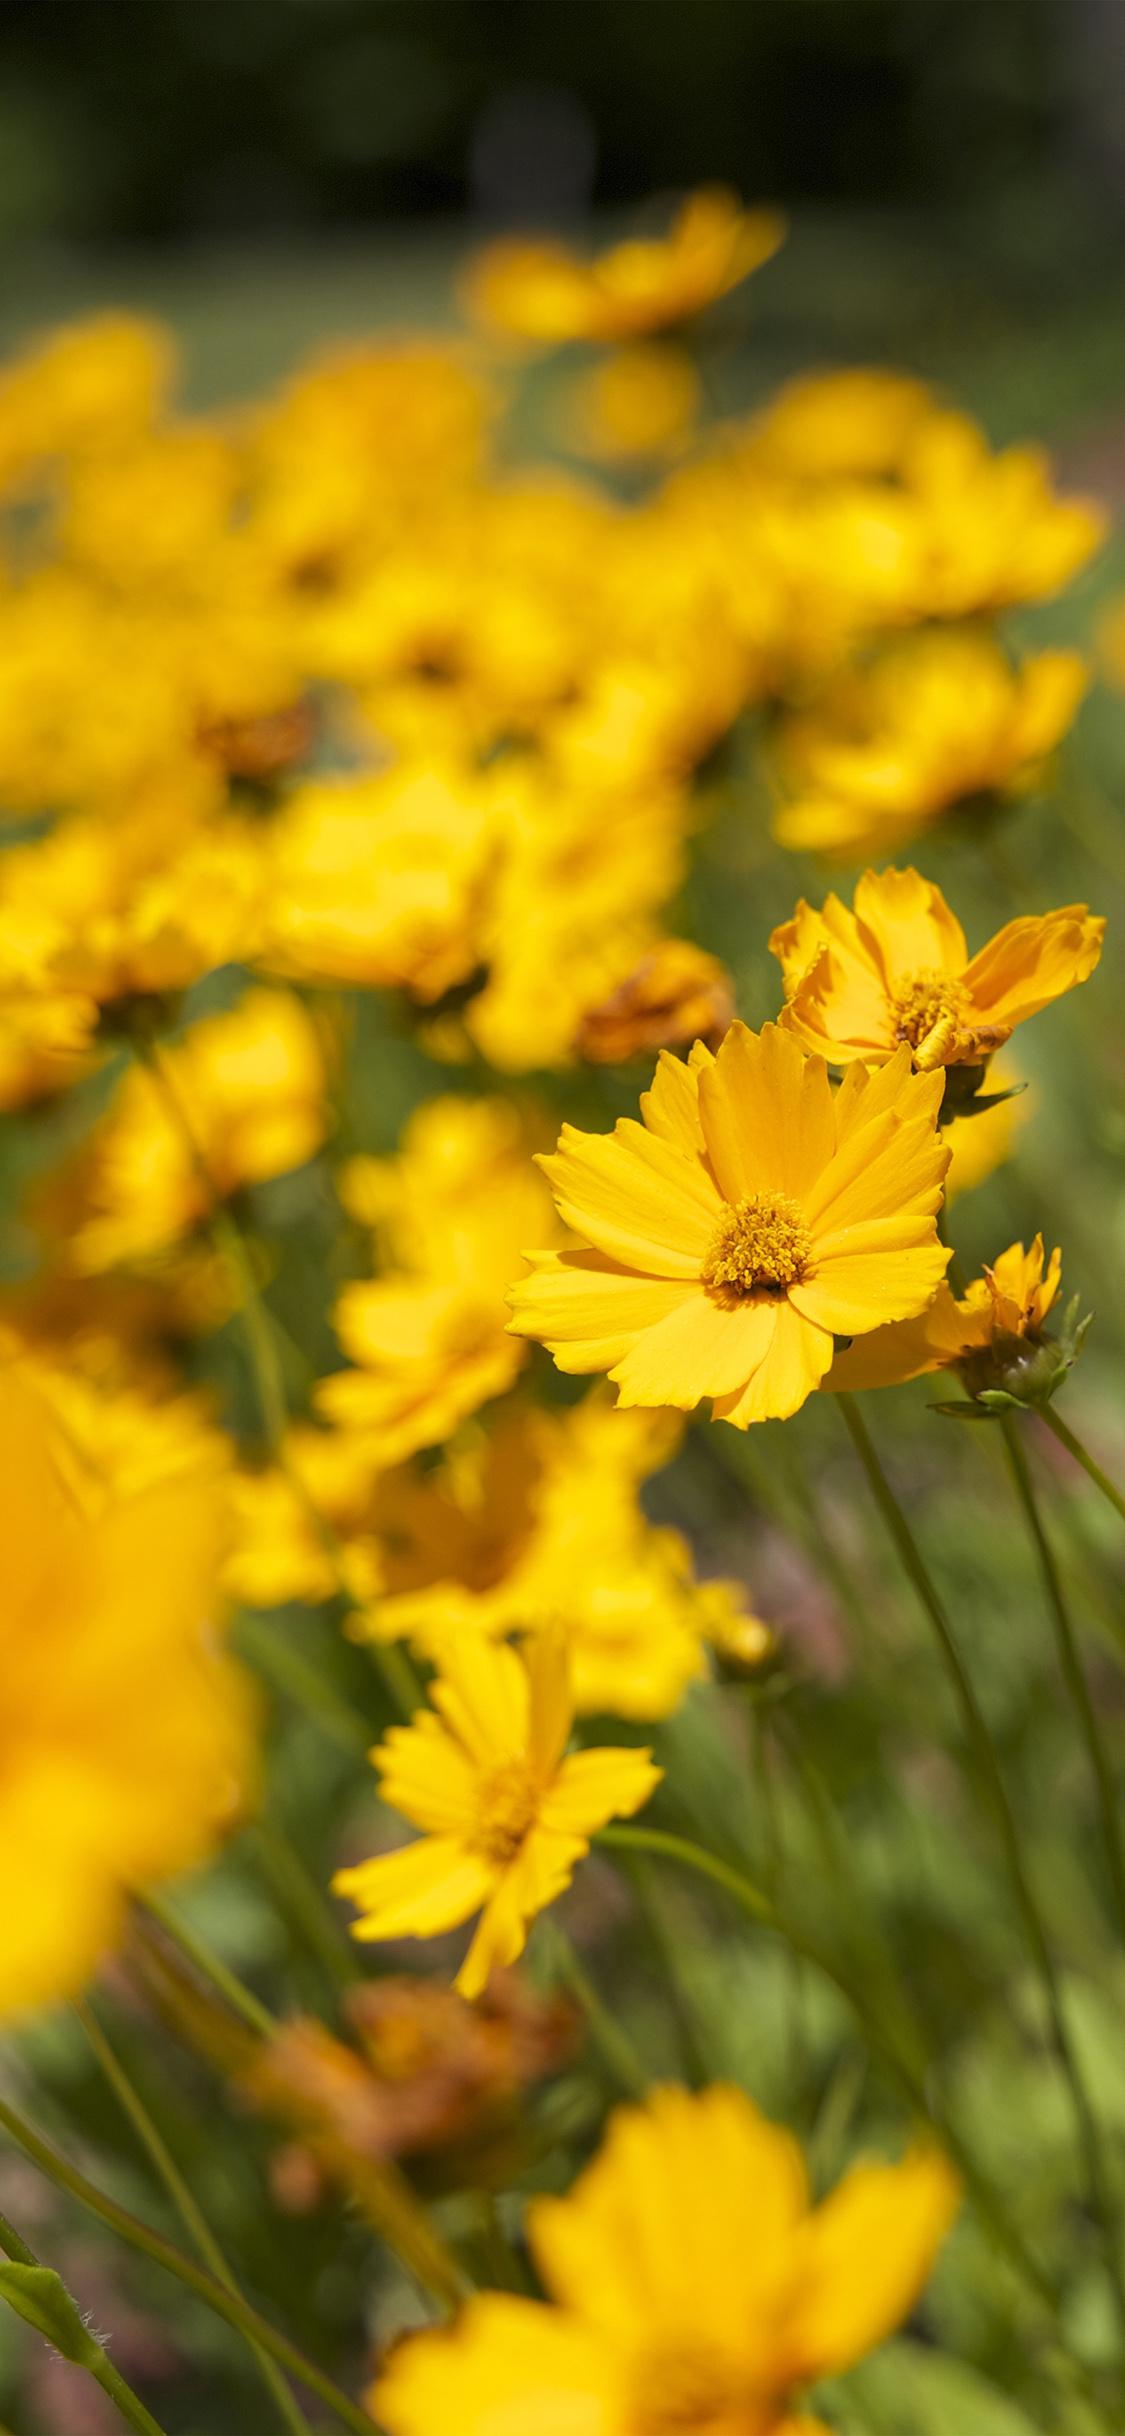 iPhoneXpapers.com-Apple-iPhone-wallpaper-mw99-flower-yellow-zoom-bokeh-summer-delight